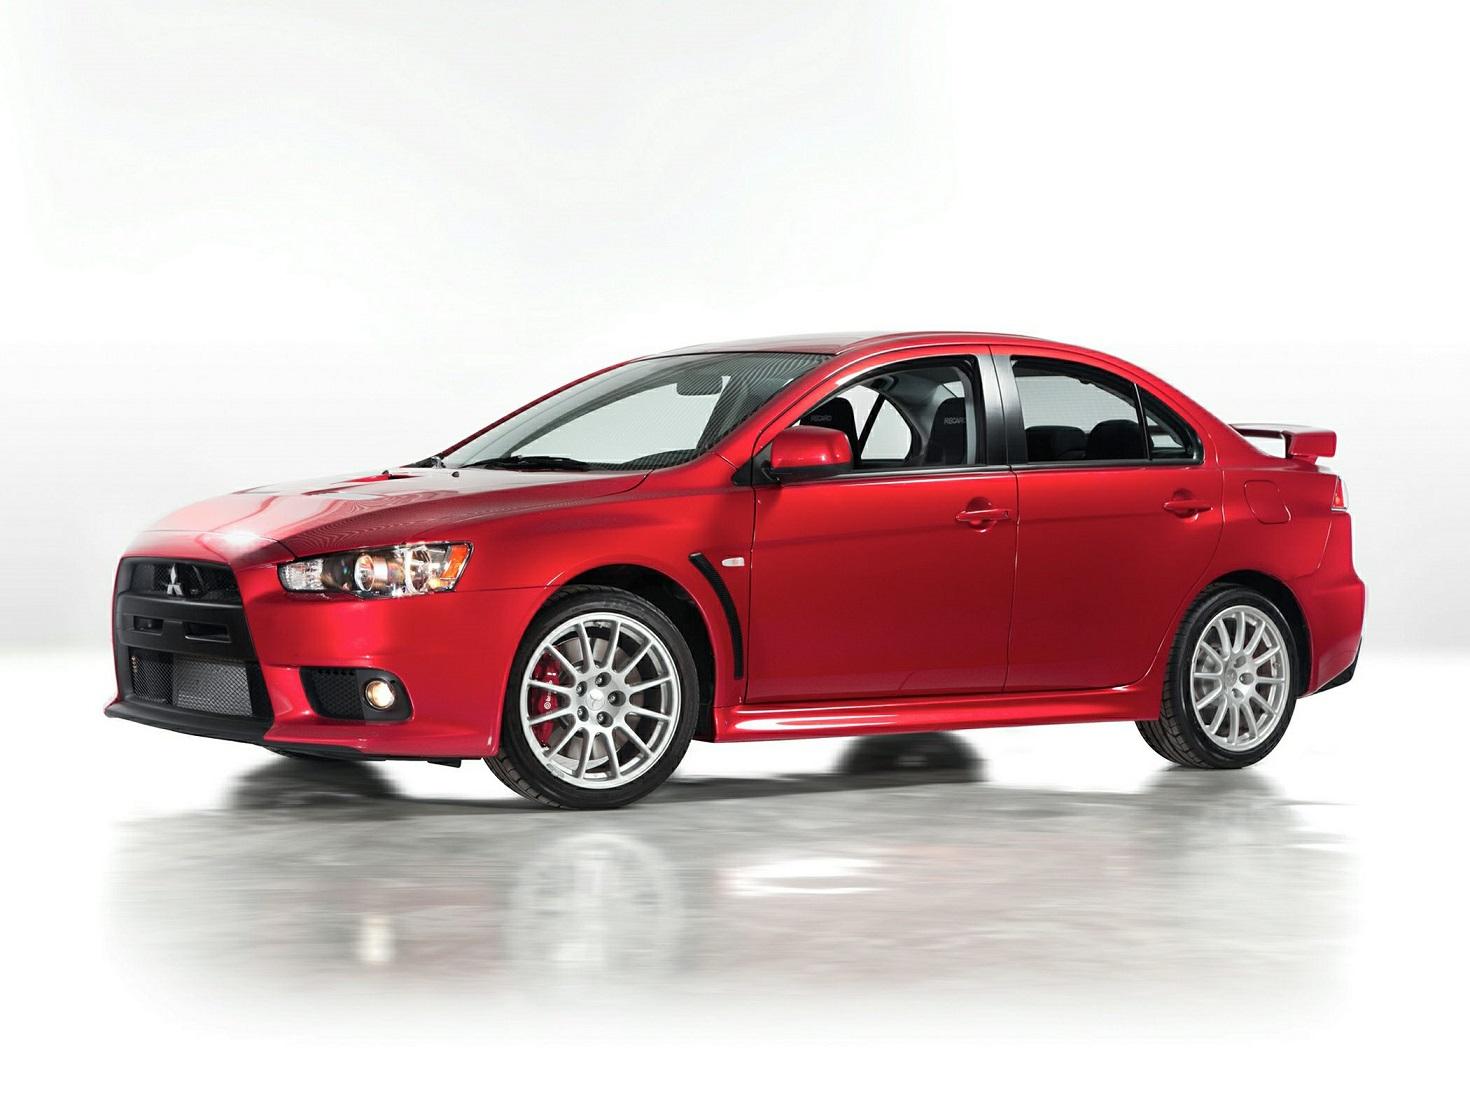 2014_Mitsubishi_Lancer_Evolution_GSR